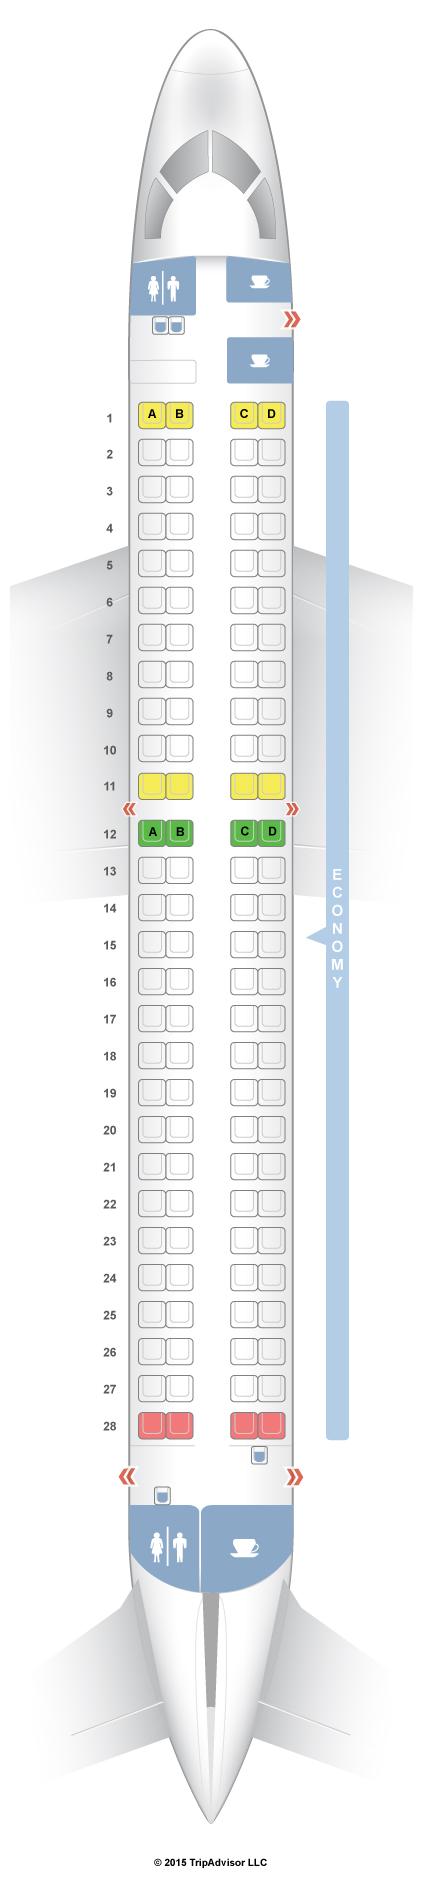 SeatGuru Seat Map LOT Polish Airlines on